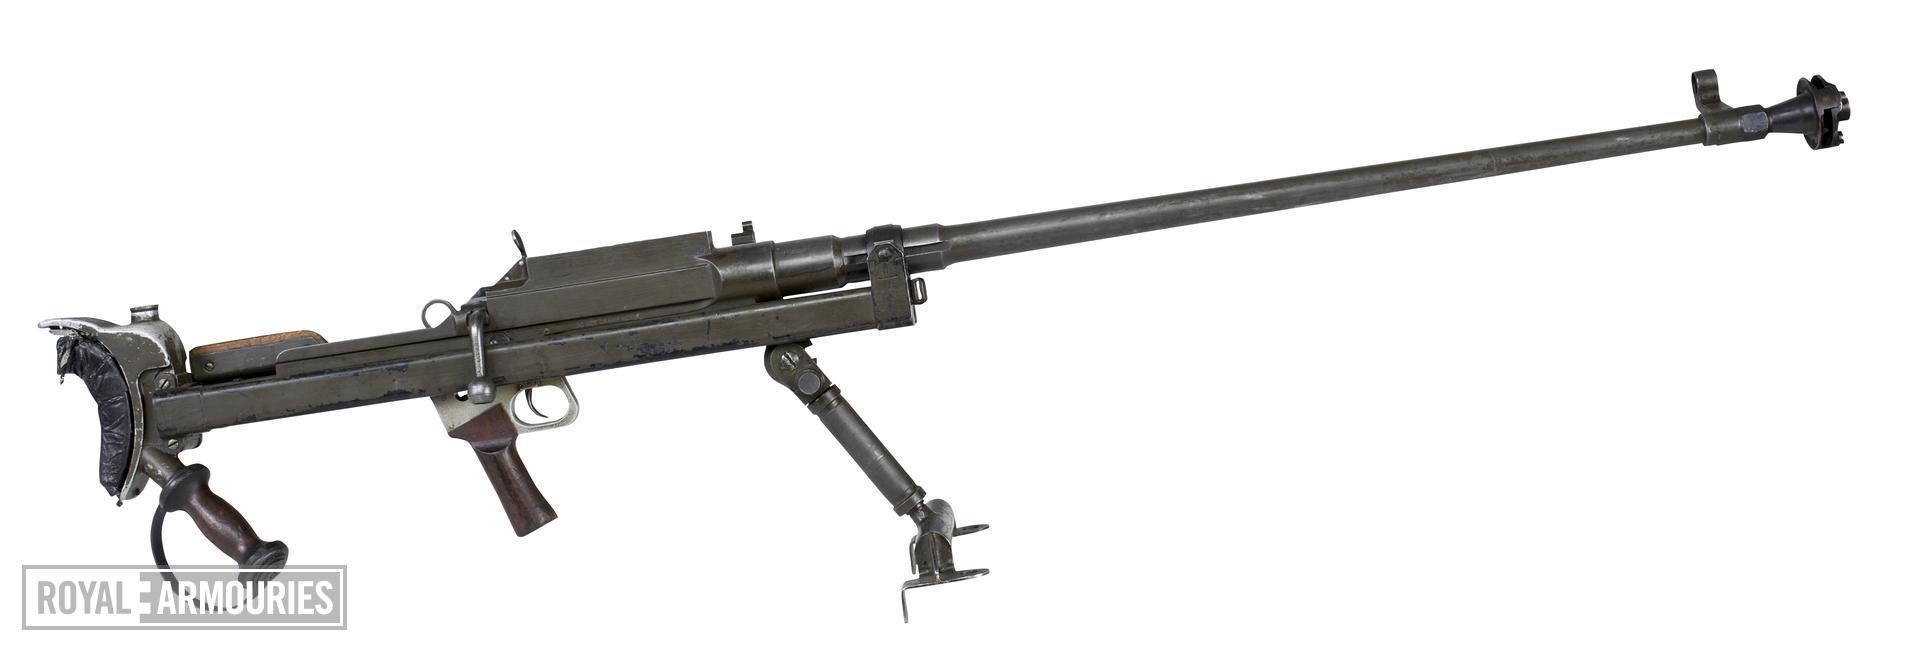 Centrefire bolt-action rifle - Boys Mk.I